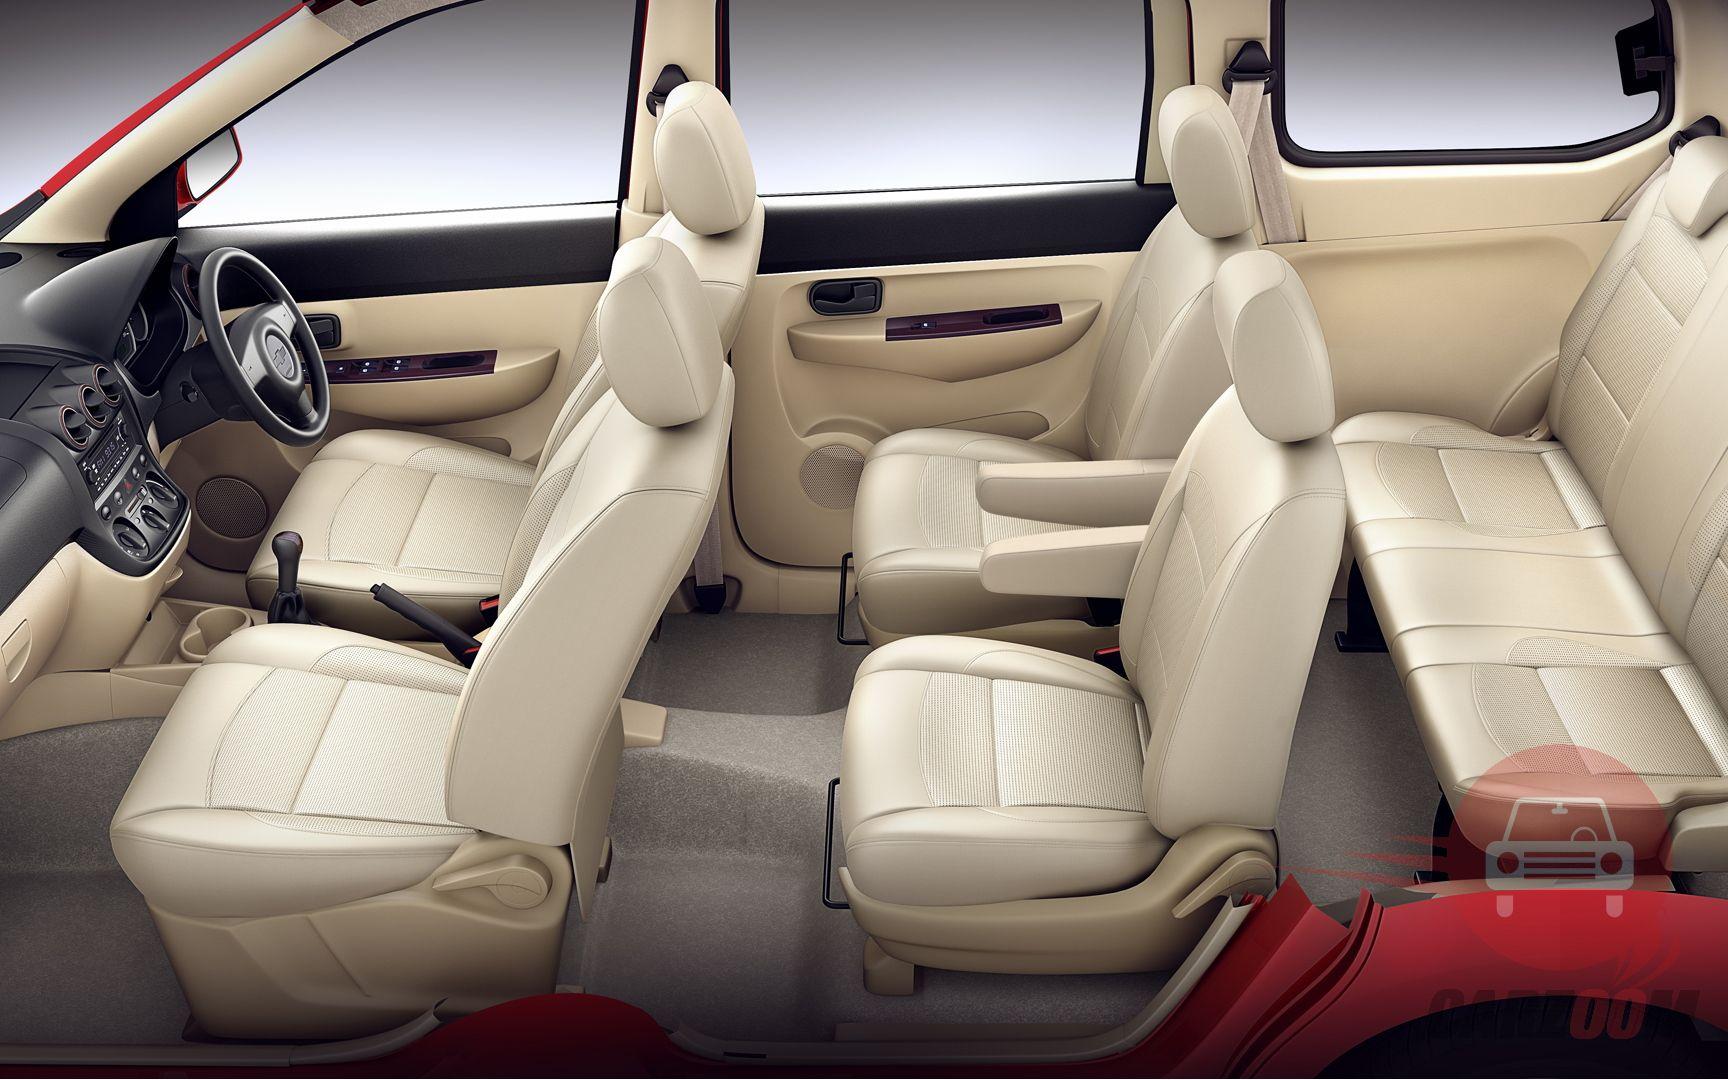 Chevrolet Enjoy Interiors Seats